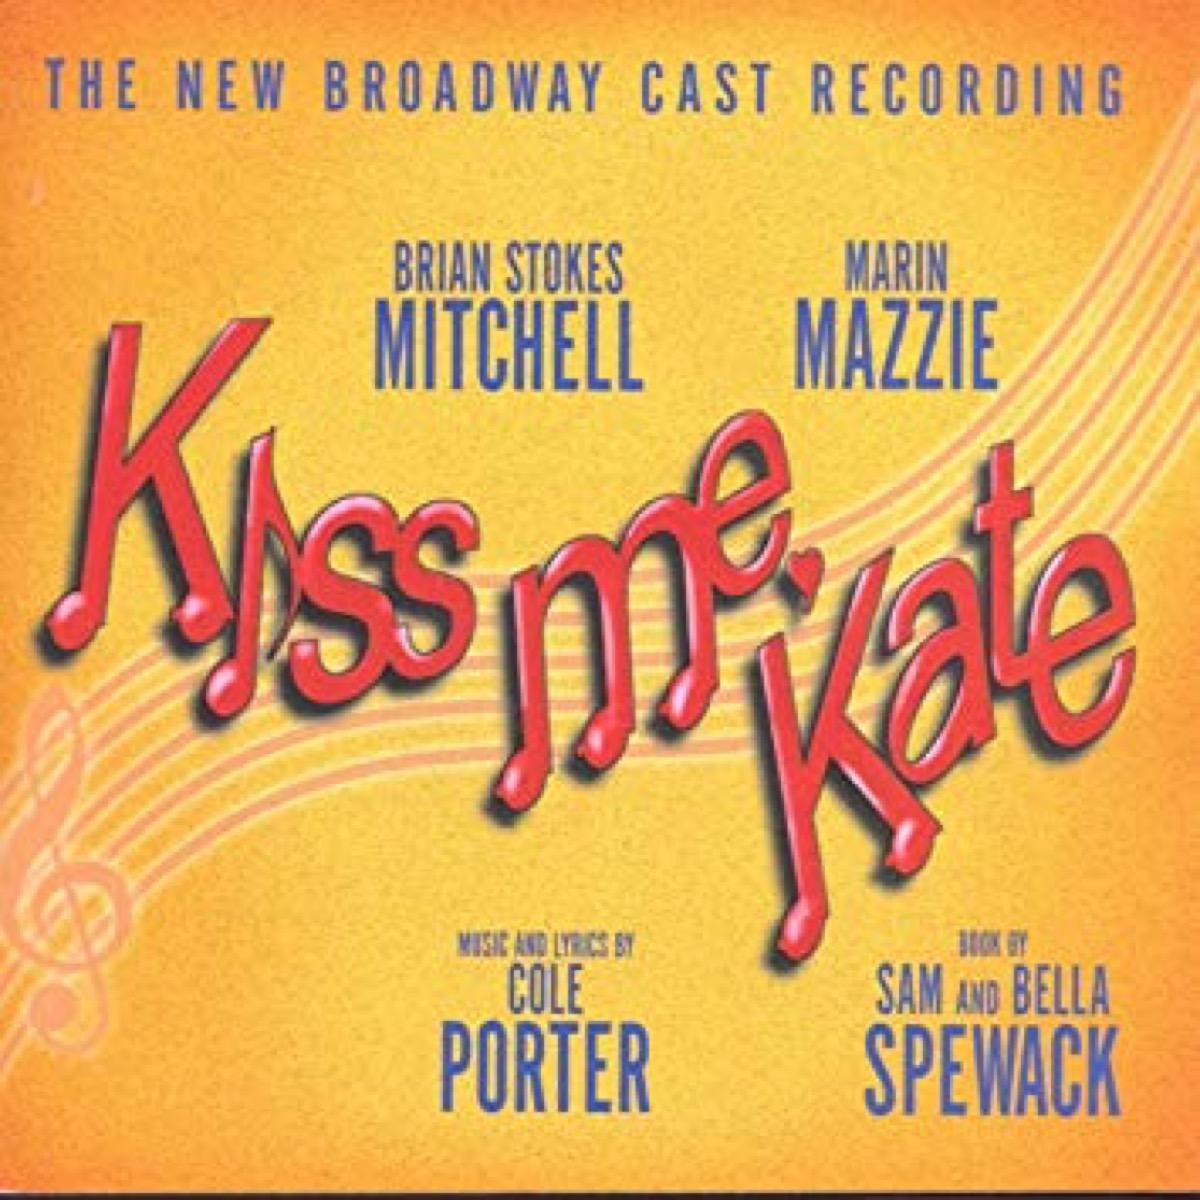 kiss me kate cast recording for broadwau